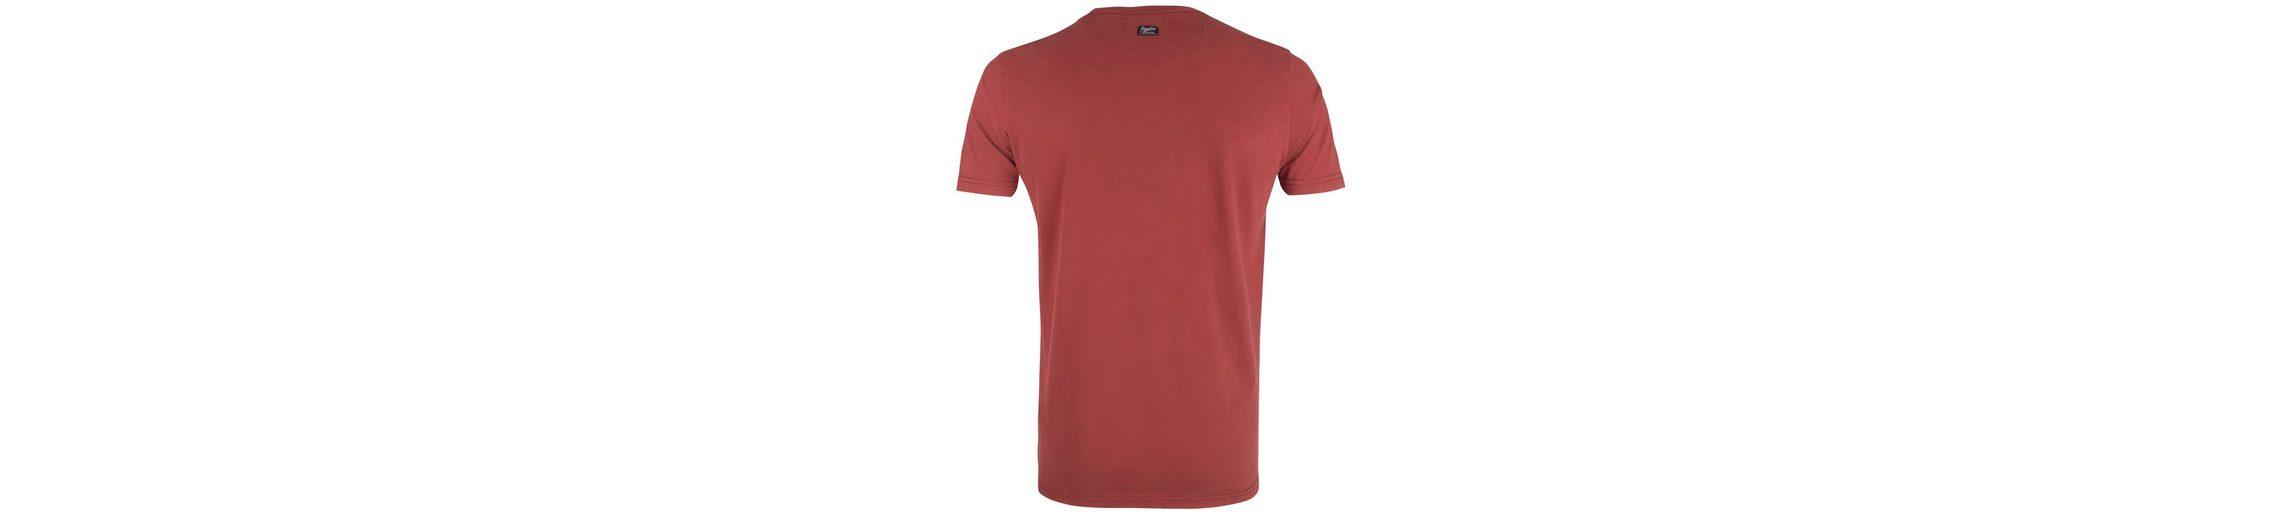 Rabatt Fälschung Verkauf Wahl Petrol Industries T-Shirt fPLeFOU